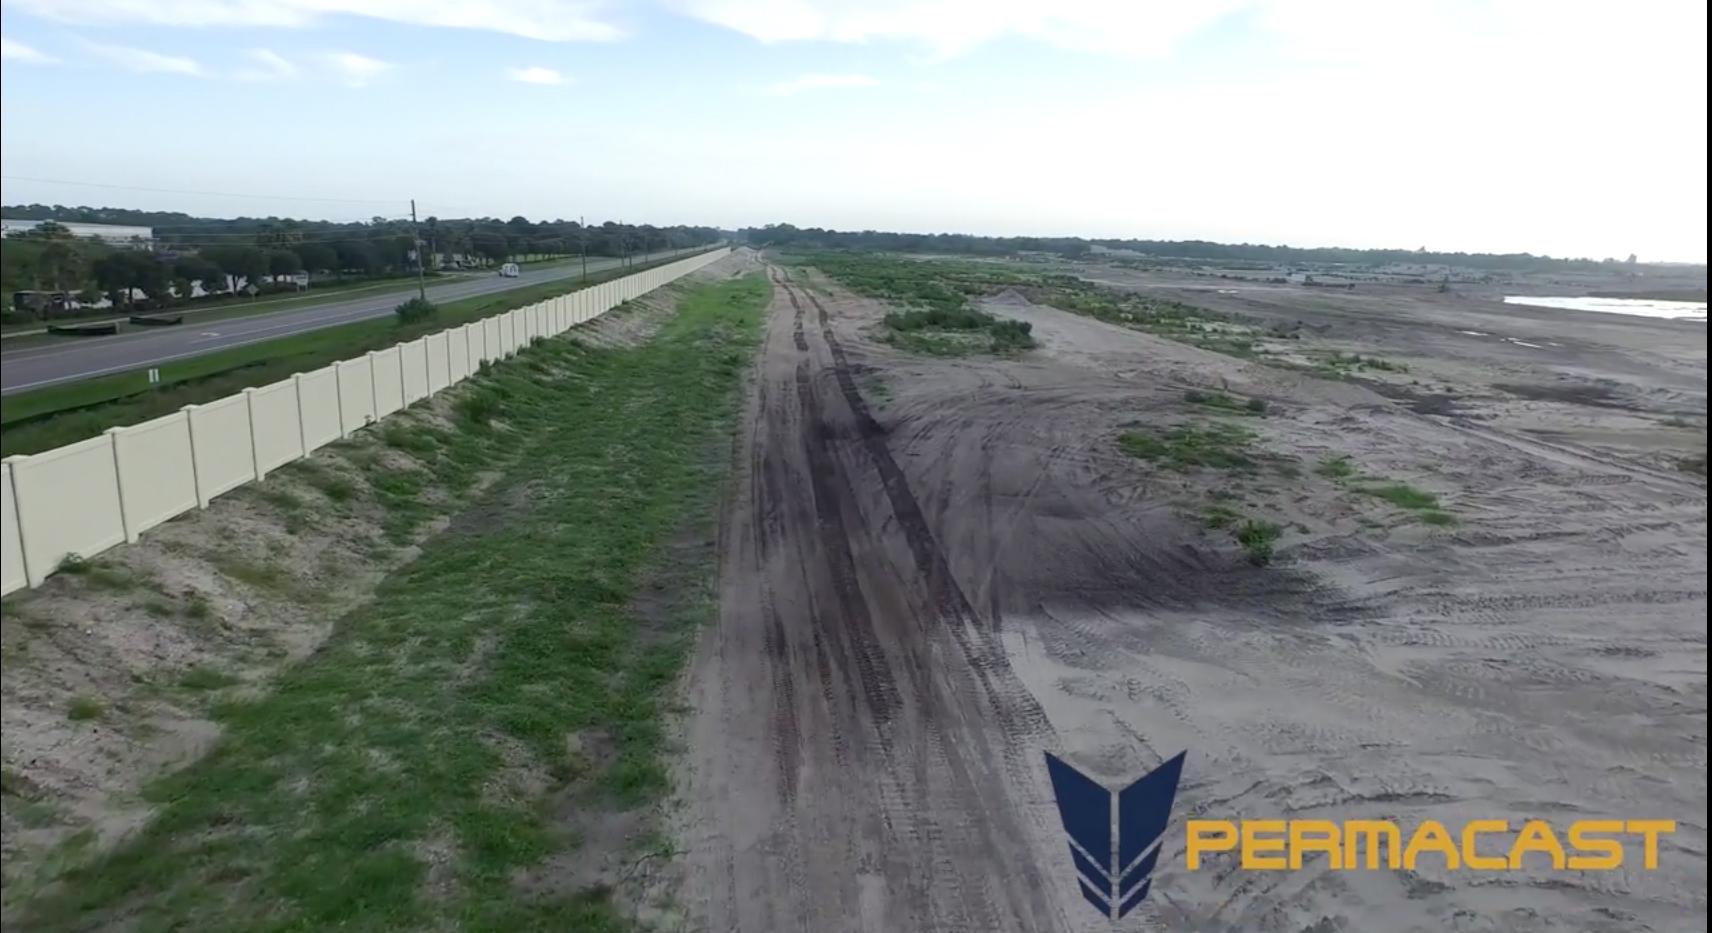 Florida precast concrete fencing project by Permacast